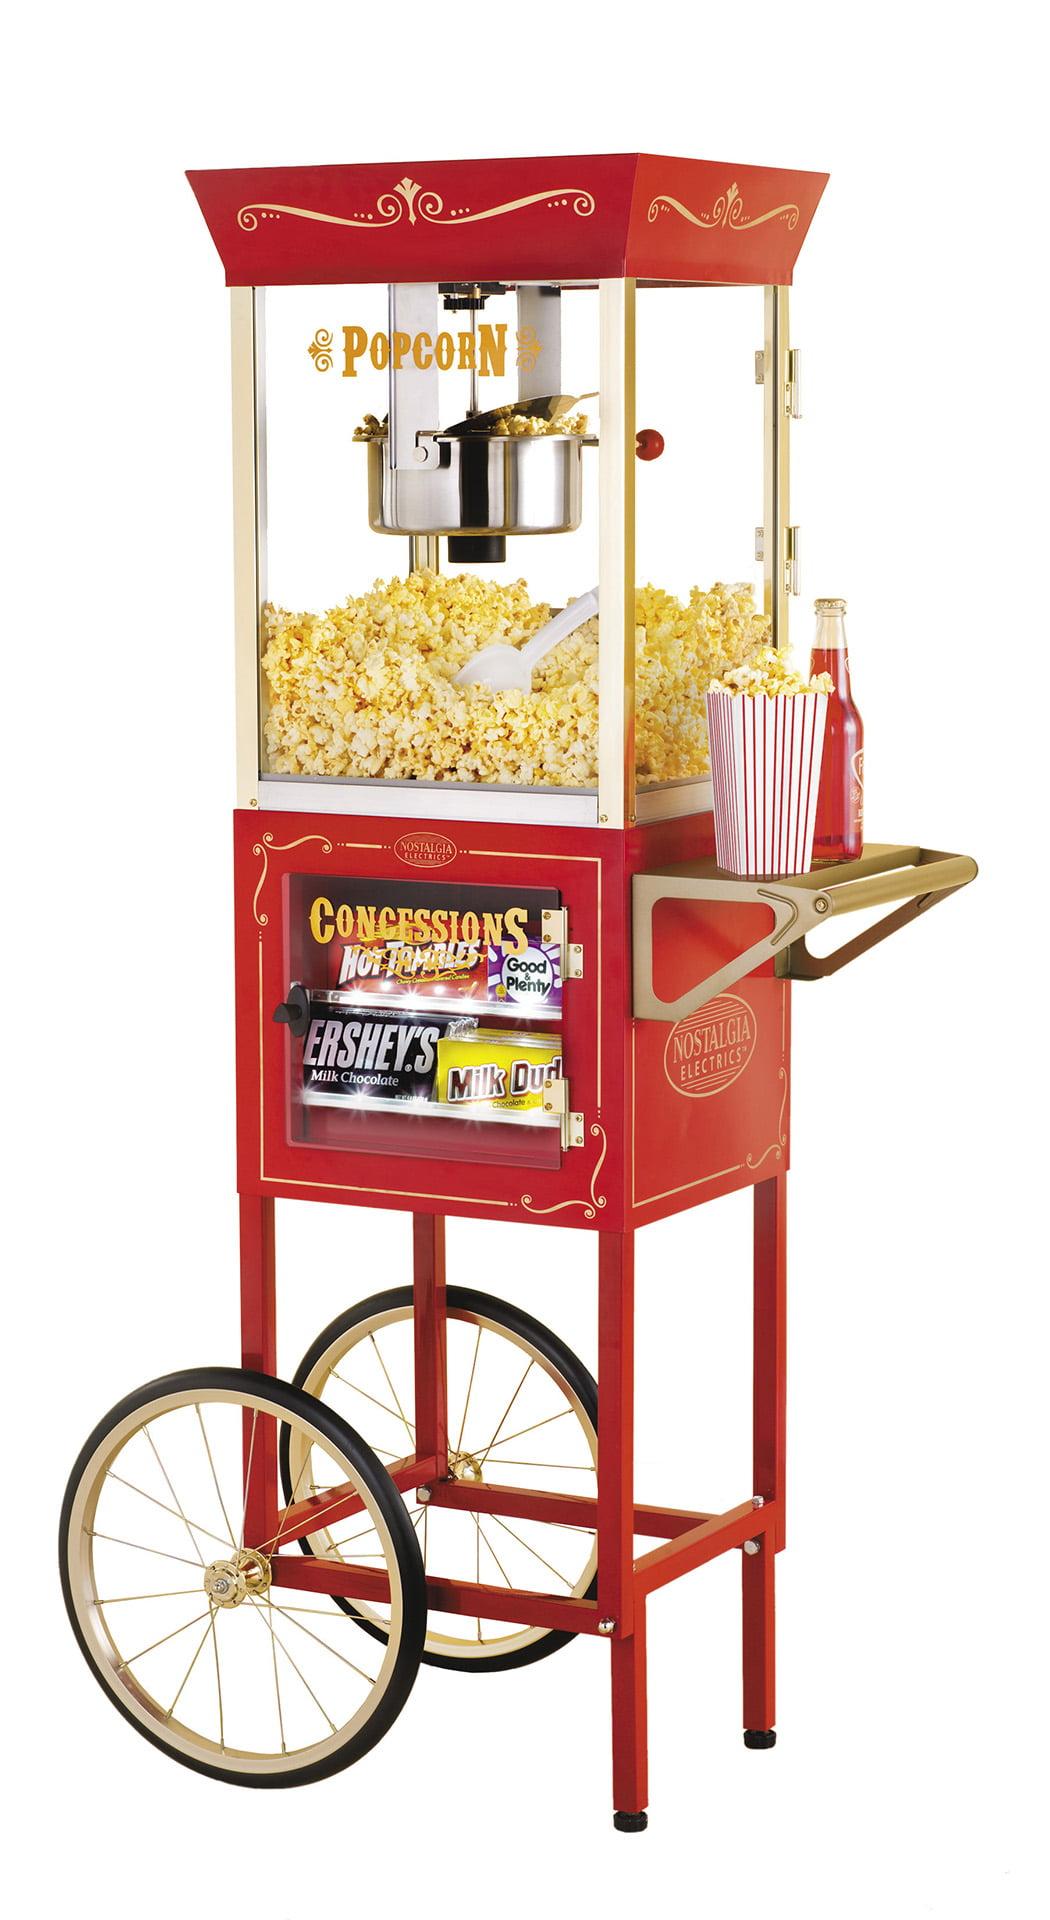 Brand Funtime Popcorn Machines Walmart Com